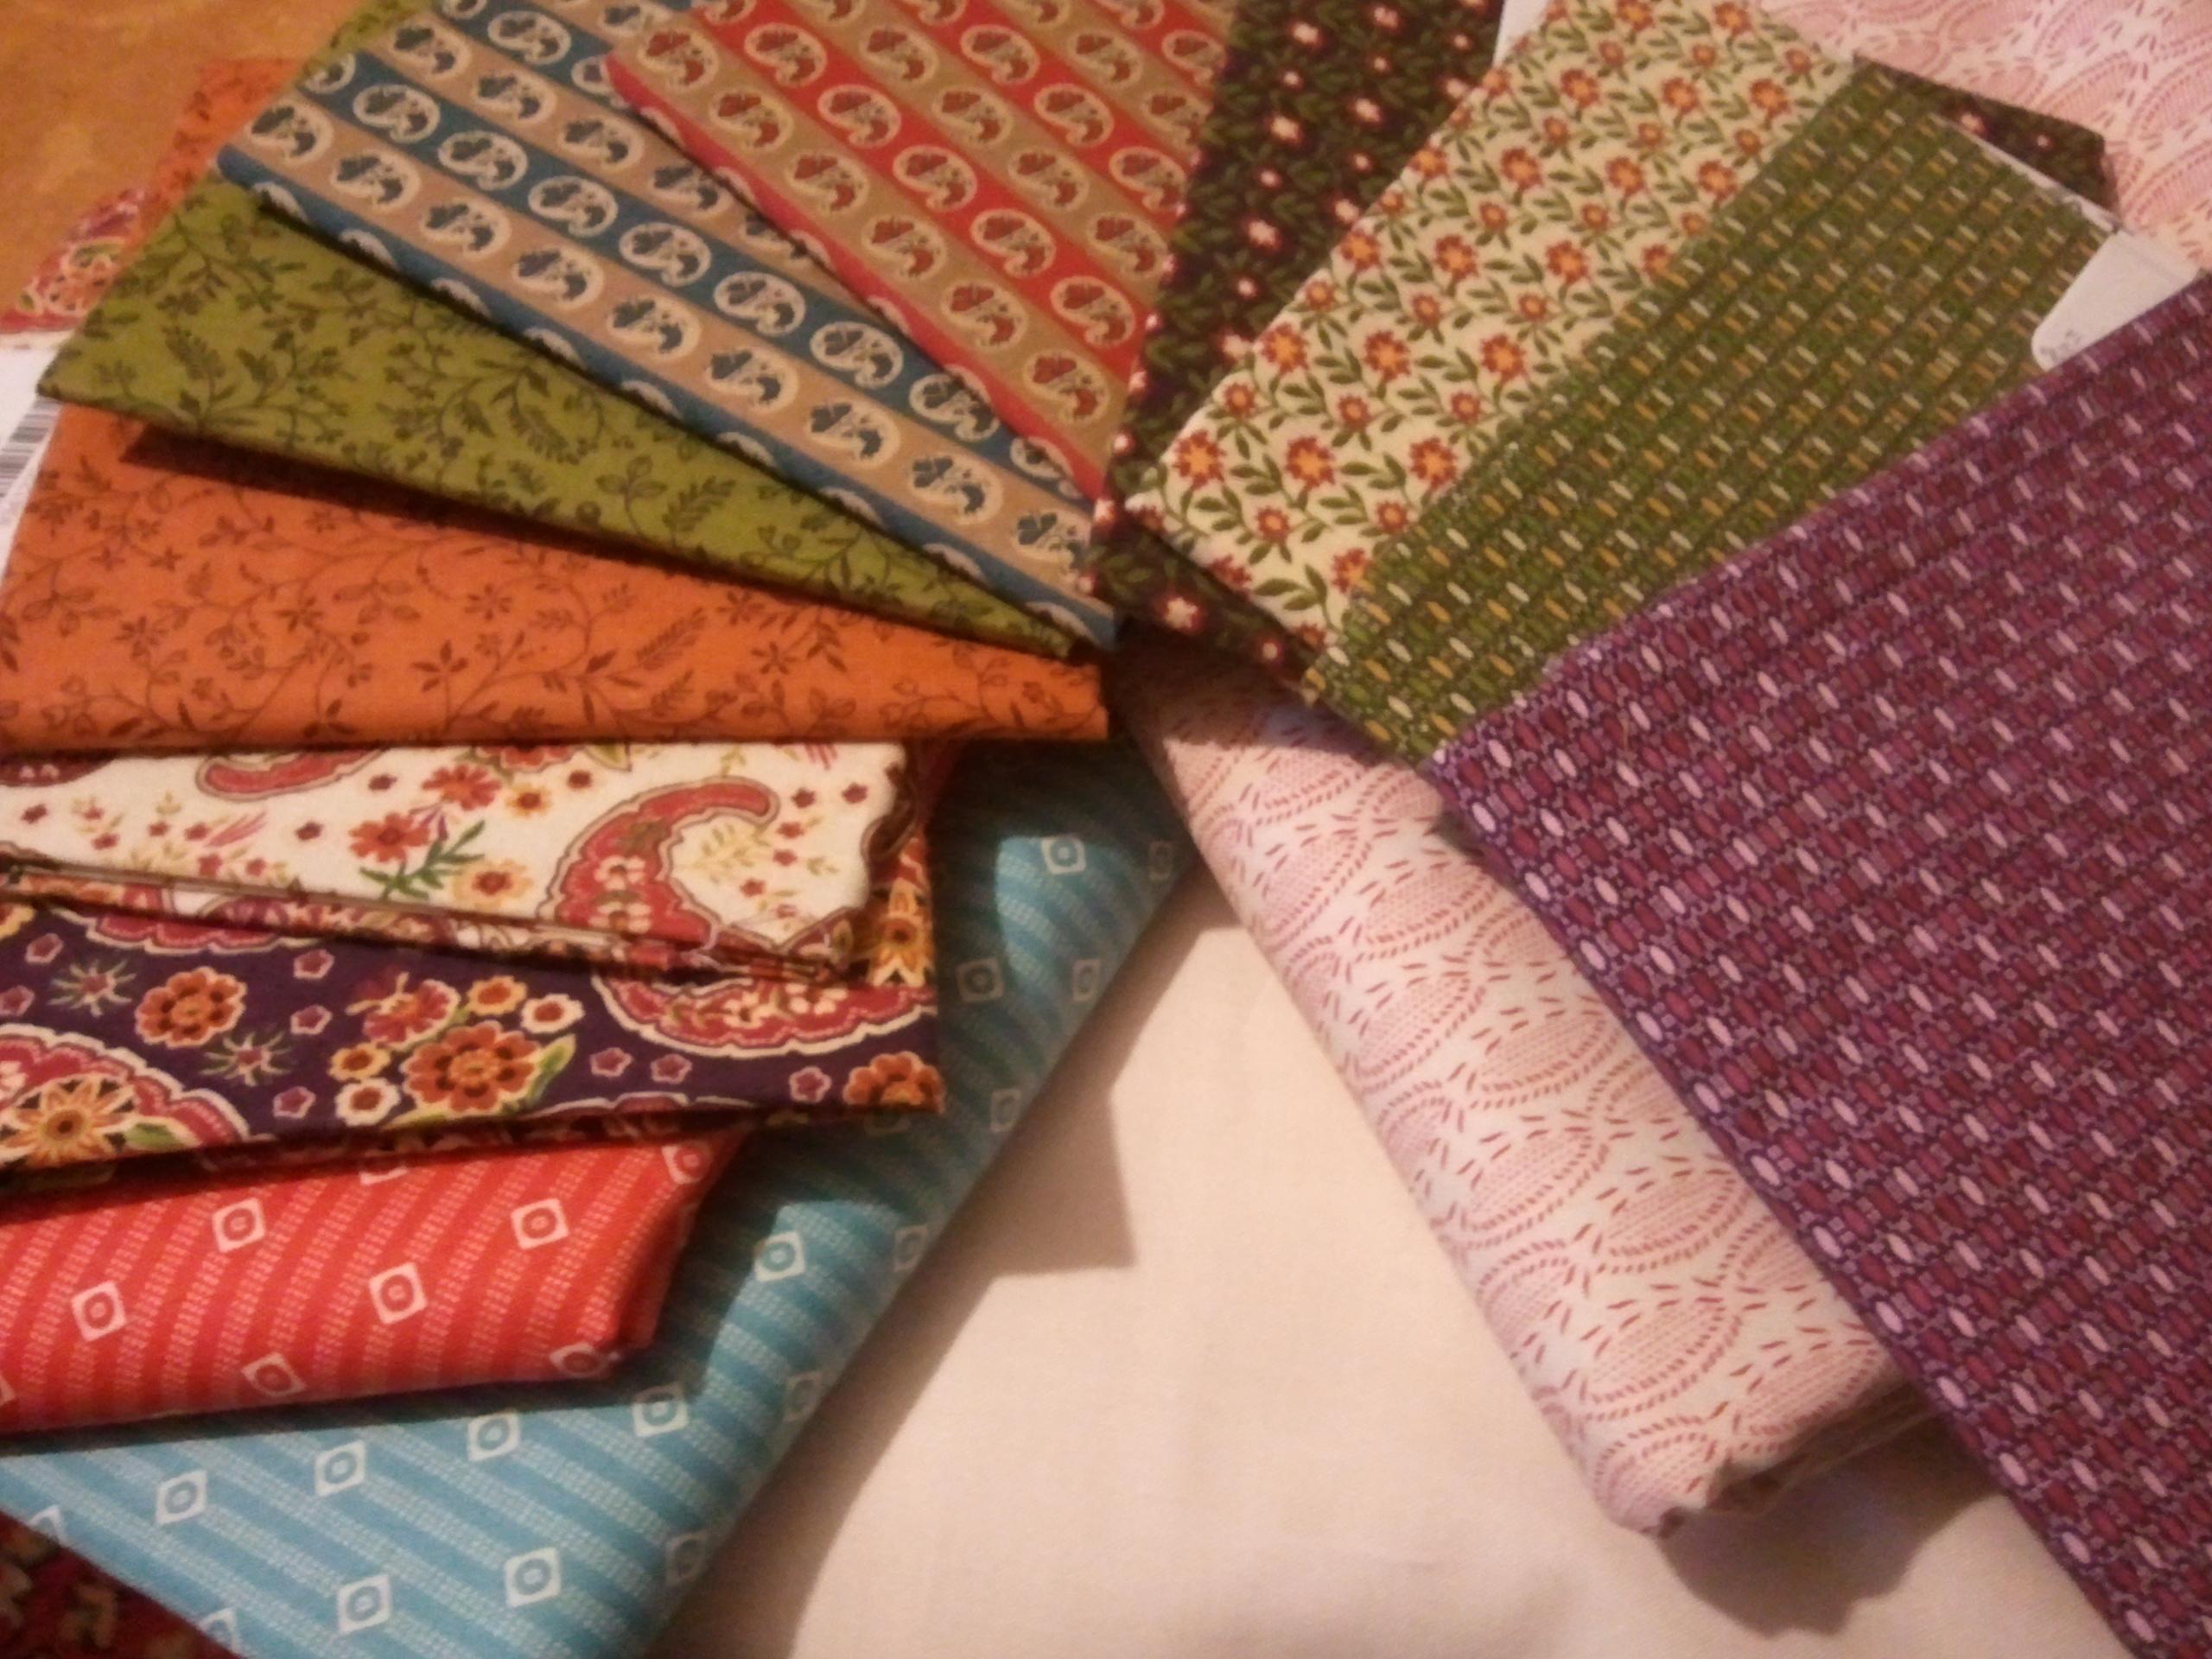 Photo of quilt materials